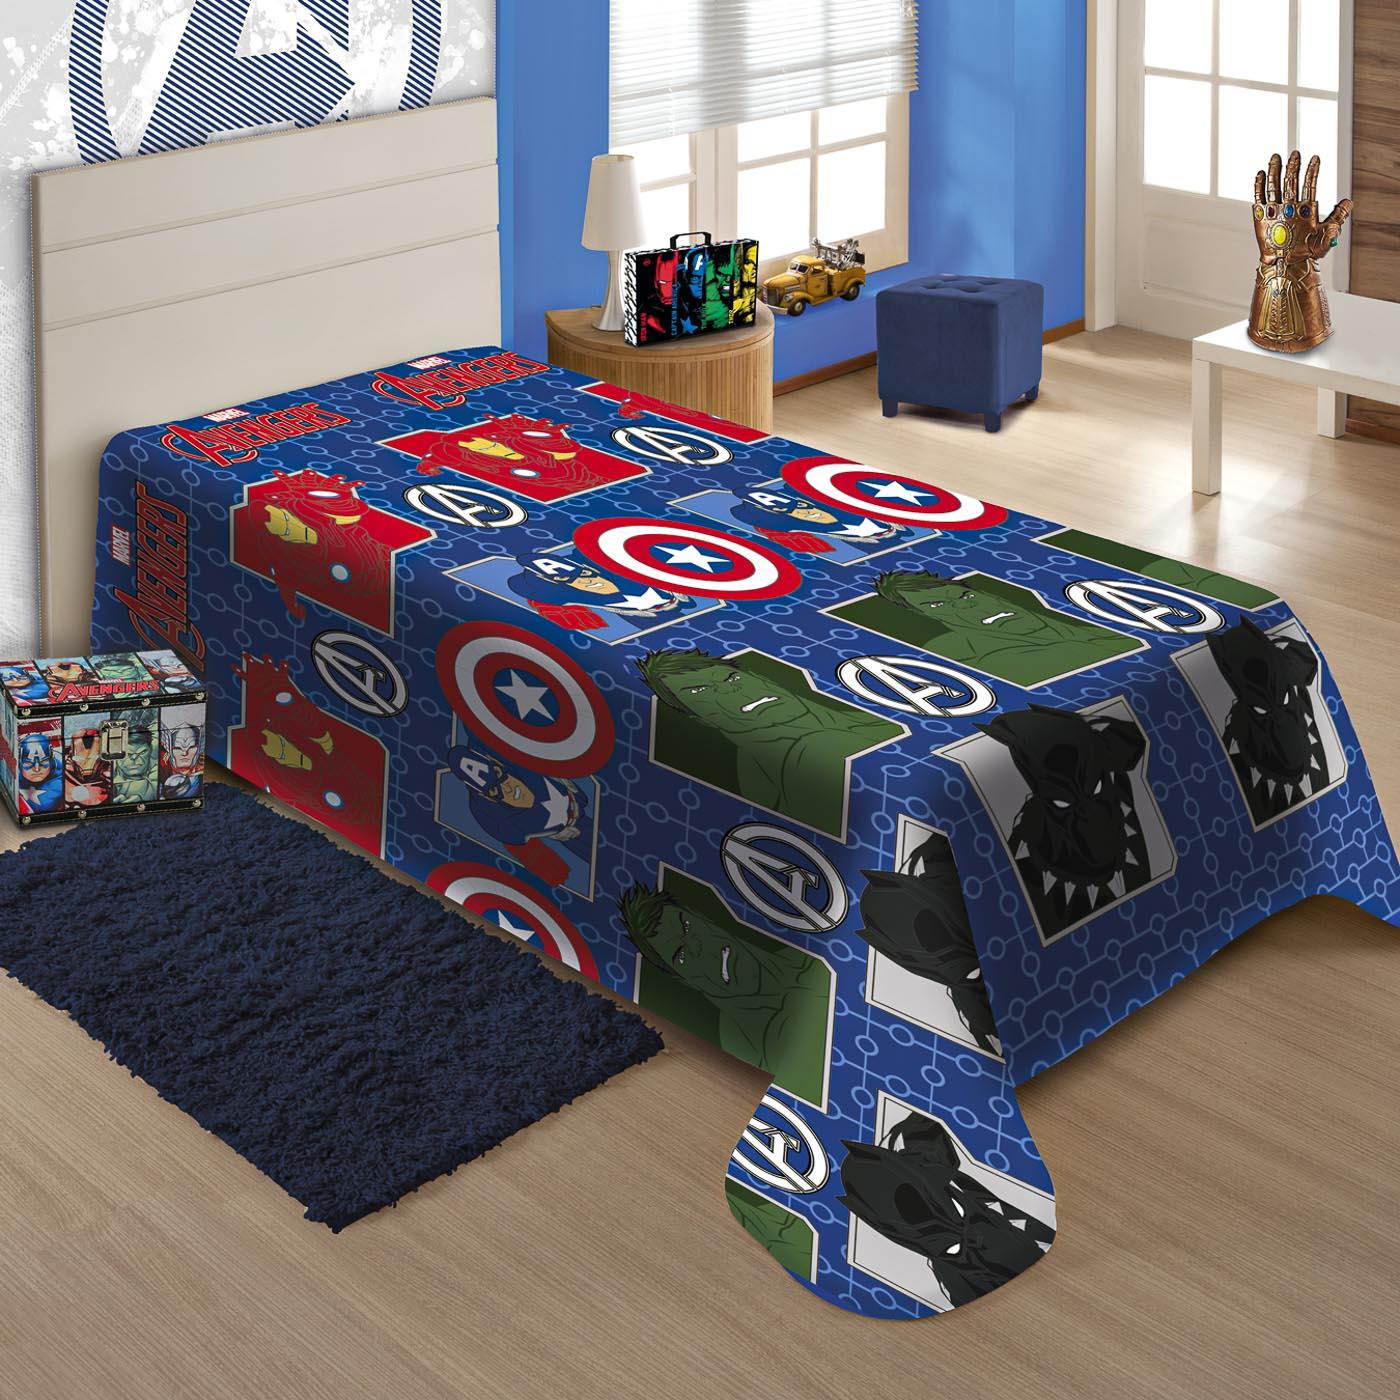 Cobertor Marvel Jolitex Ternille Soft Solteiro Vingadores